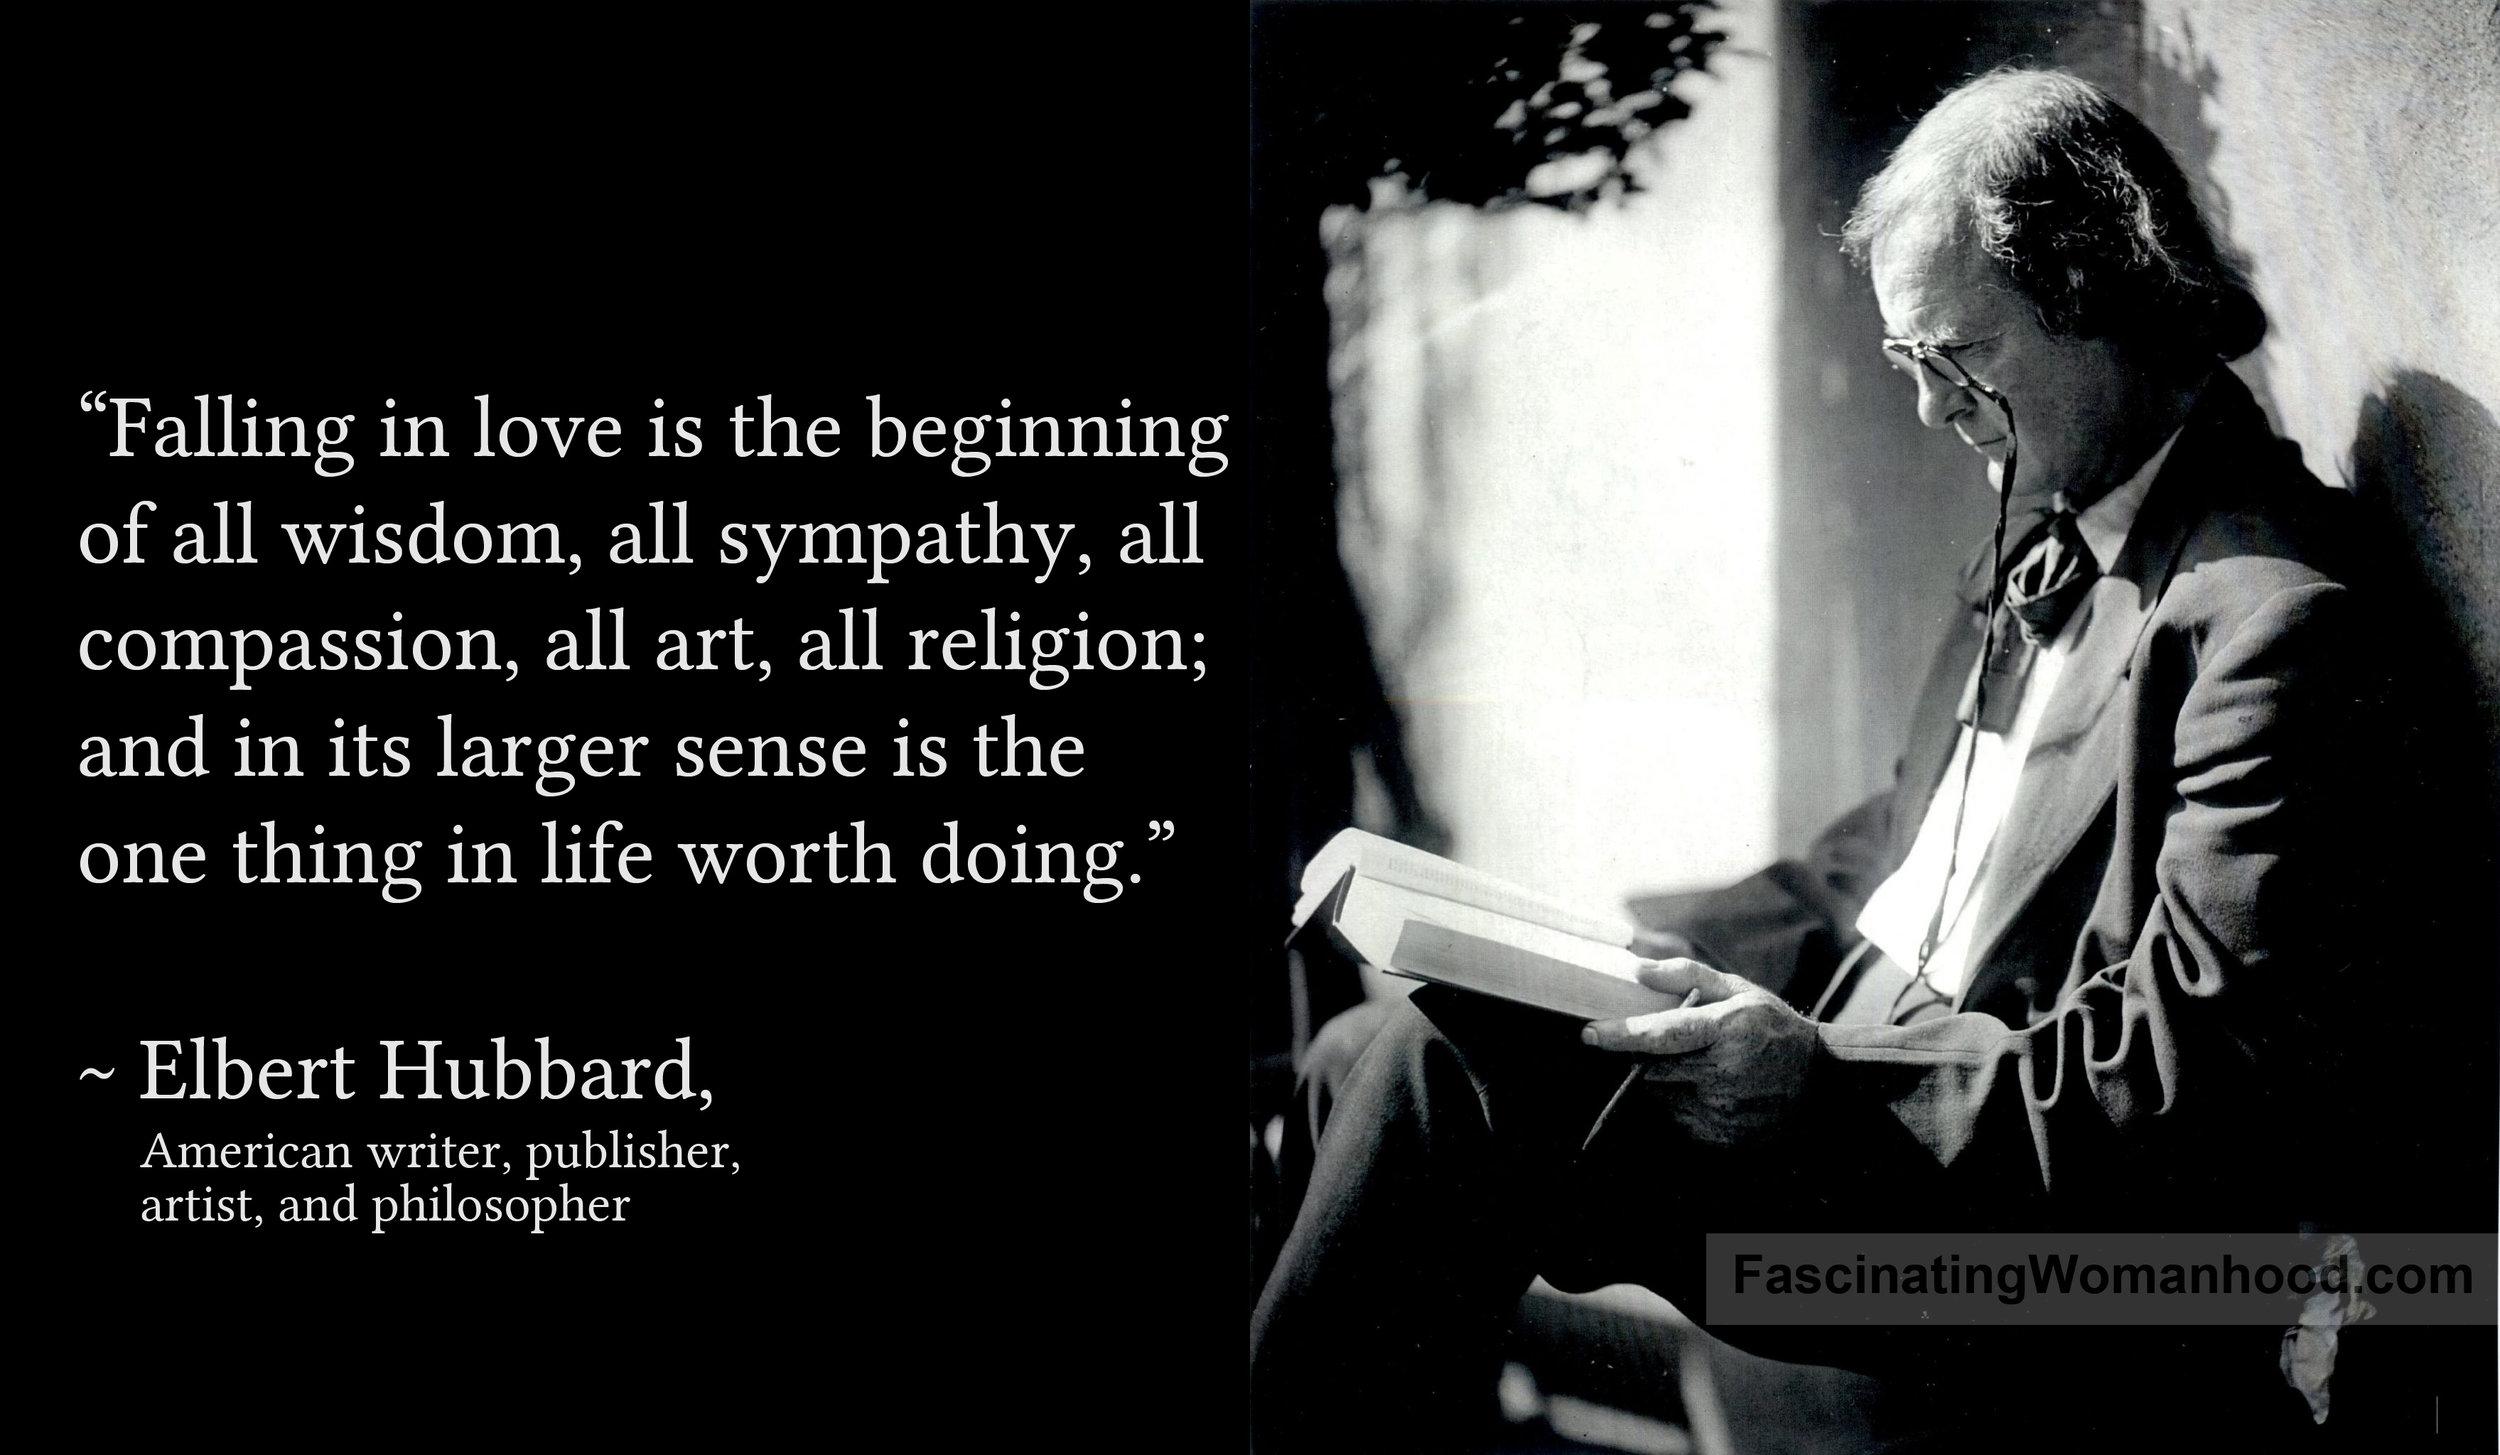 A Quote by Elbert Hubbard 2.jpg